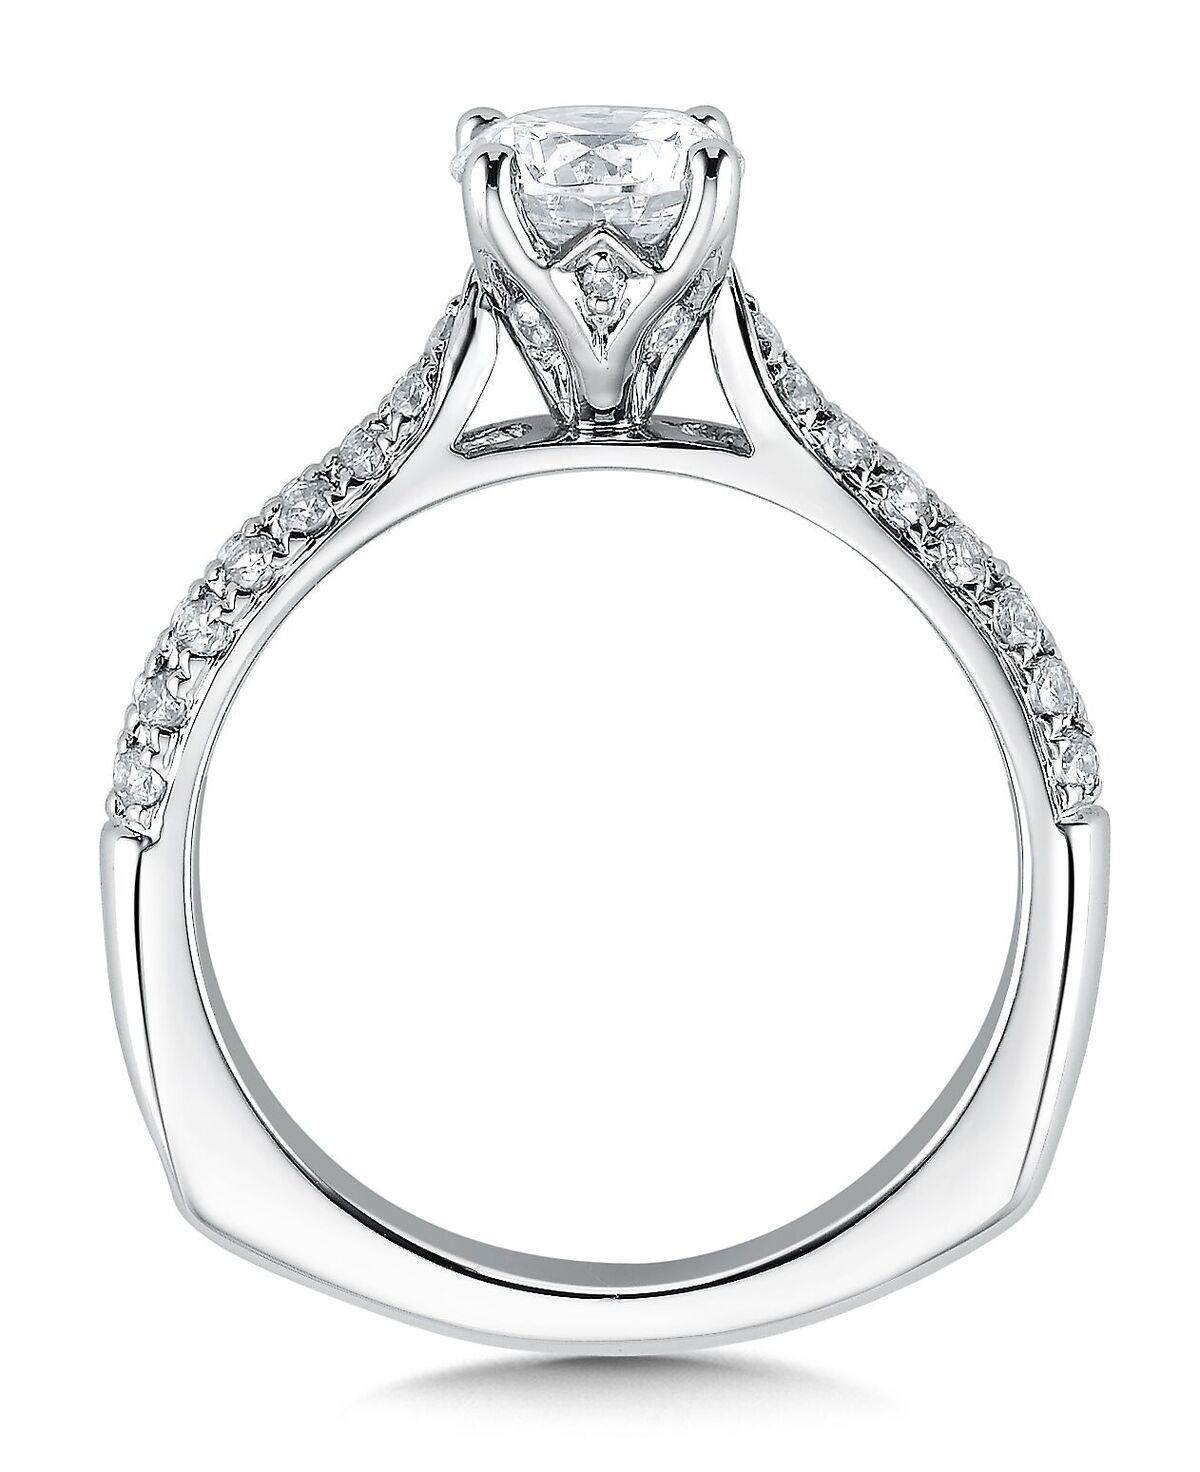 Pave Diamond Engagement Rings Dallas Texas Pave Engagement Rings In Texas Shira Diamonds , Shira Diamonds